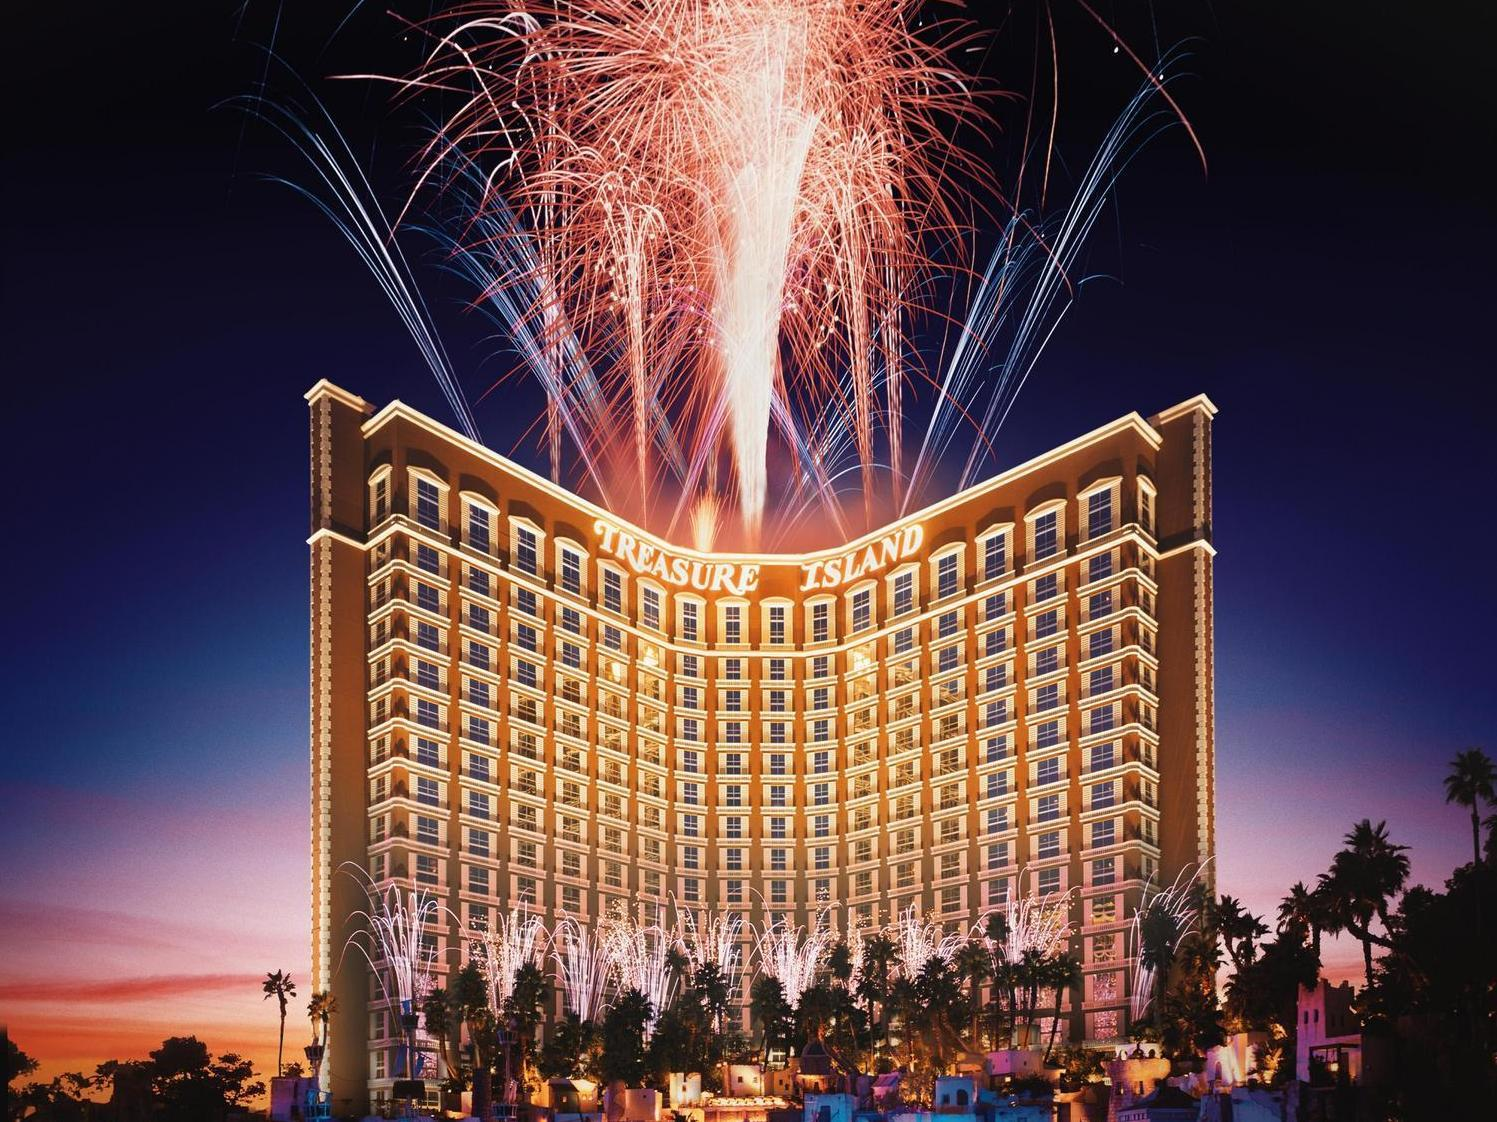 Treasure Island Hotel & Casino, Las Vegas